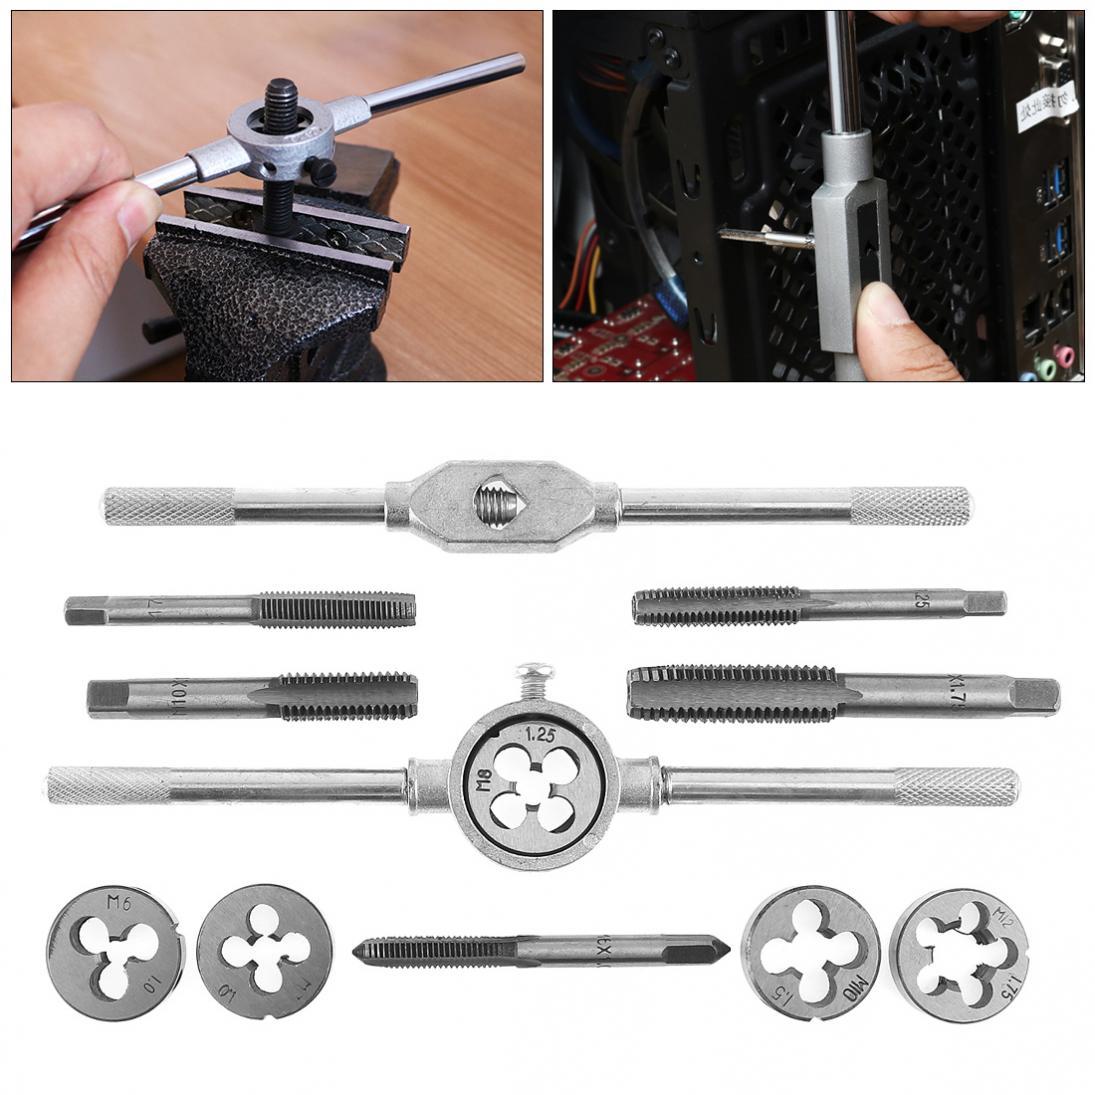 12PC Metric Tap Die Kit M6 M7 M8 M10 M12 Screw Threading Wrench Mold Tool w//Case